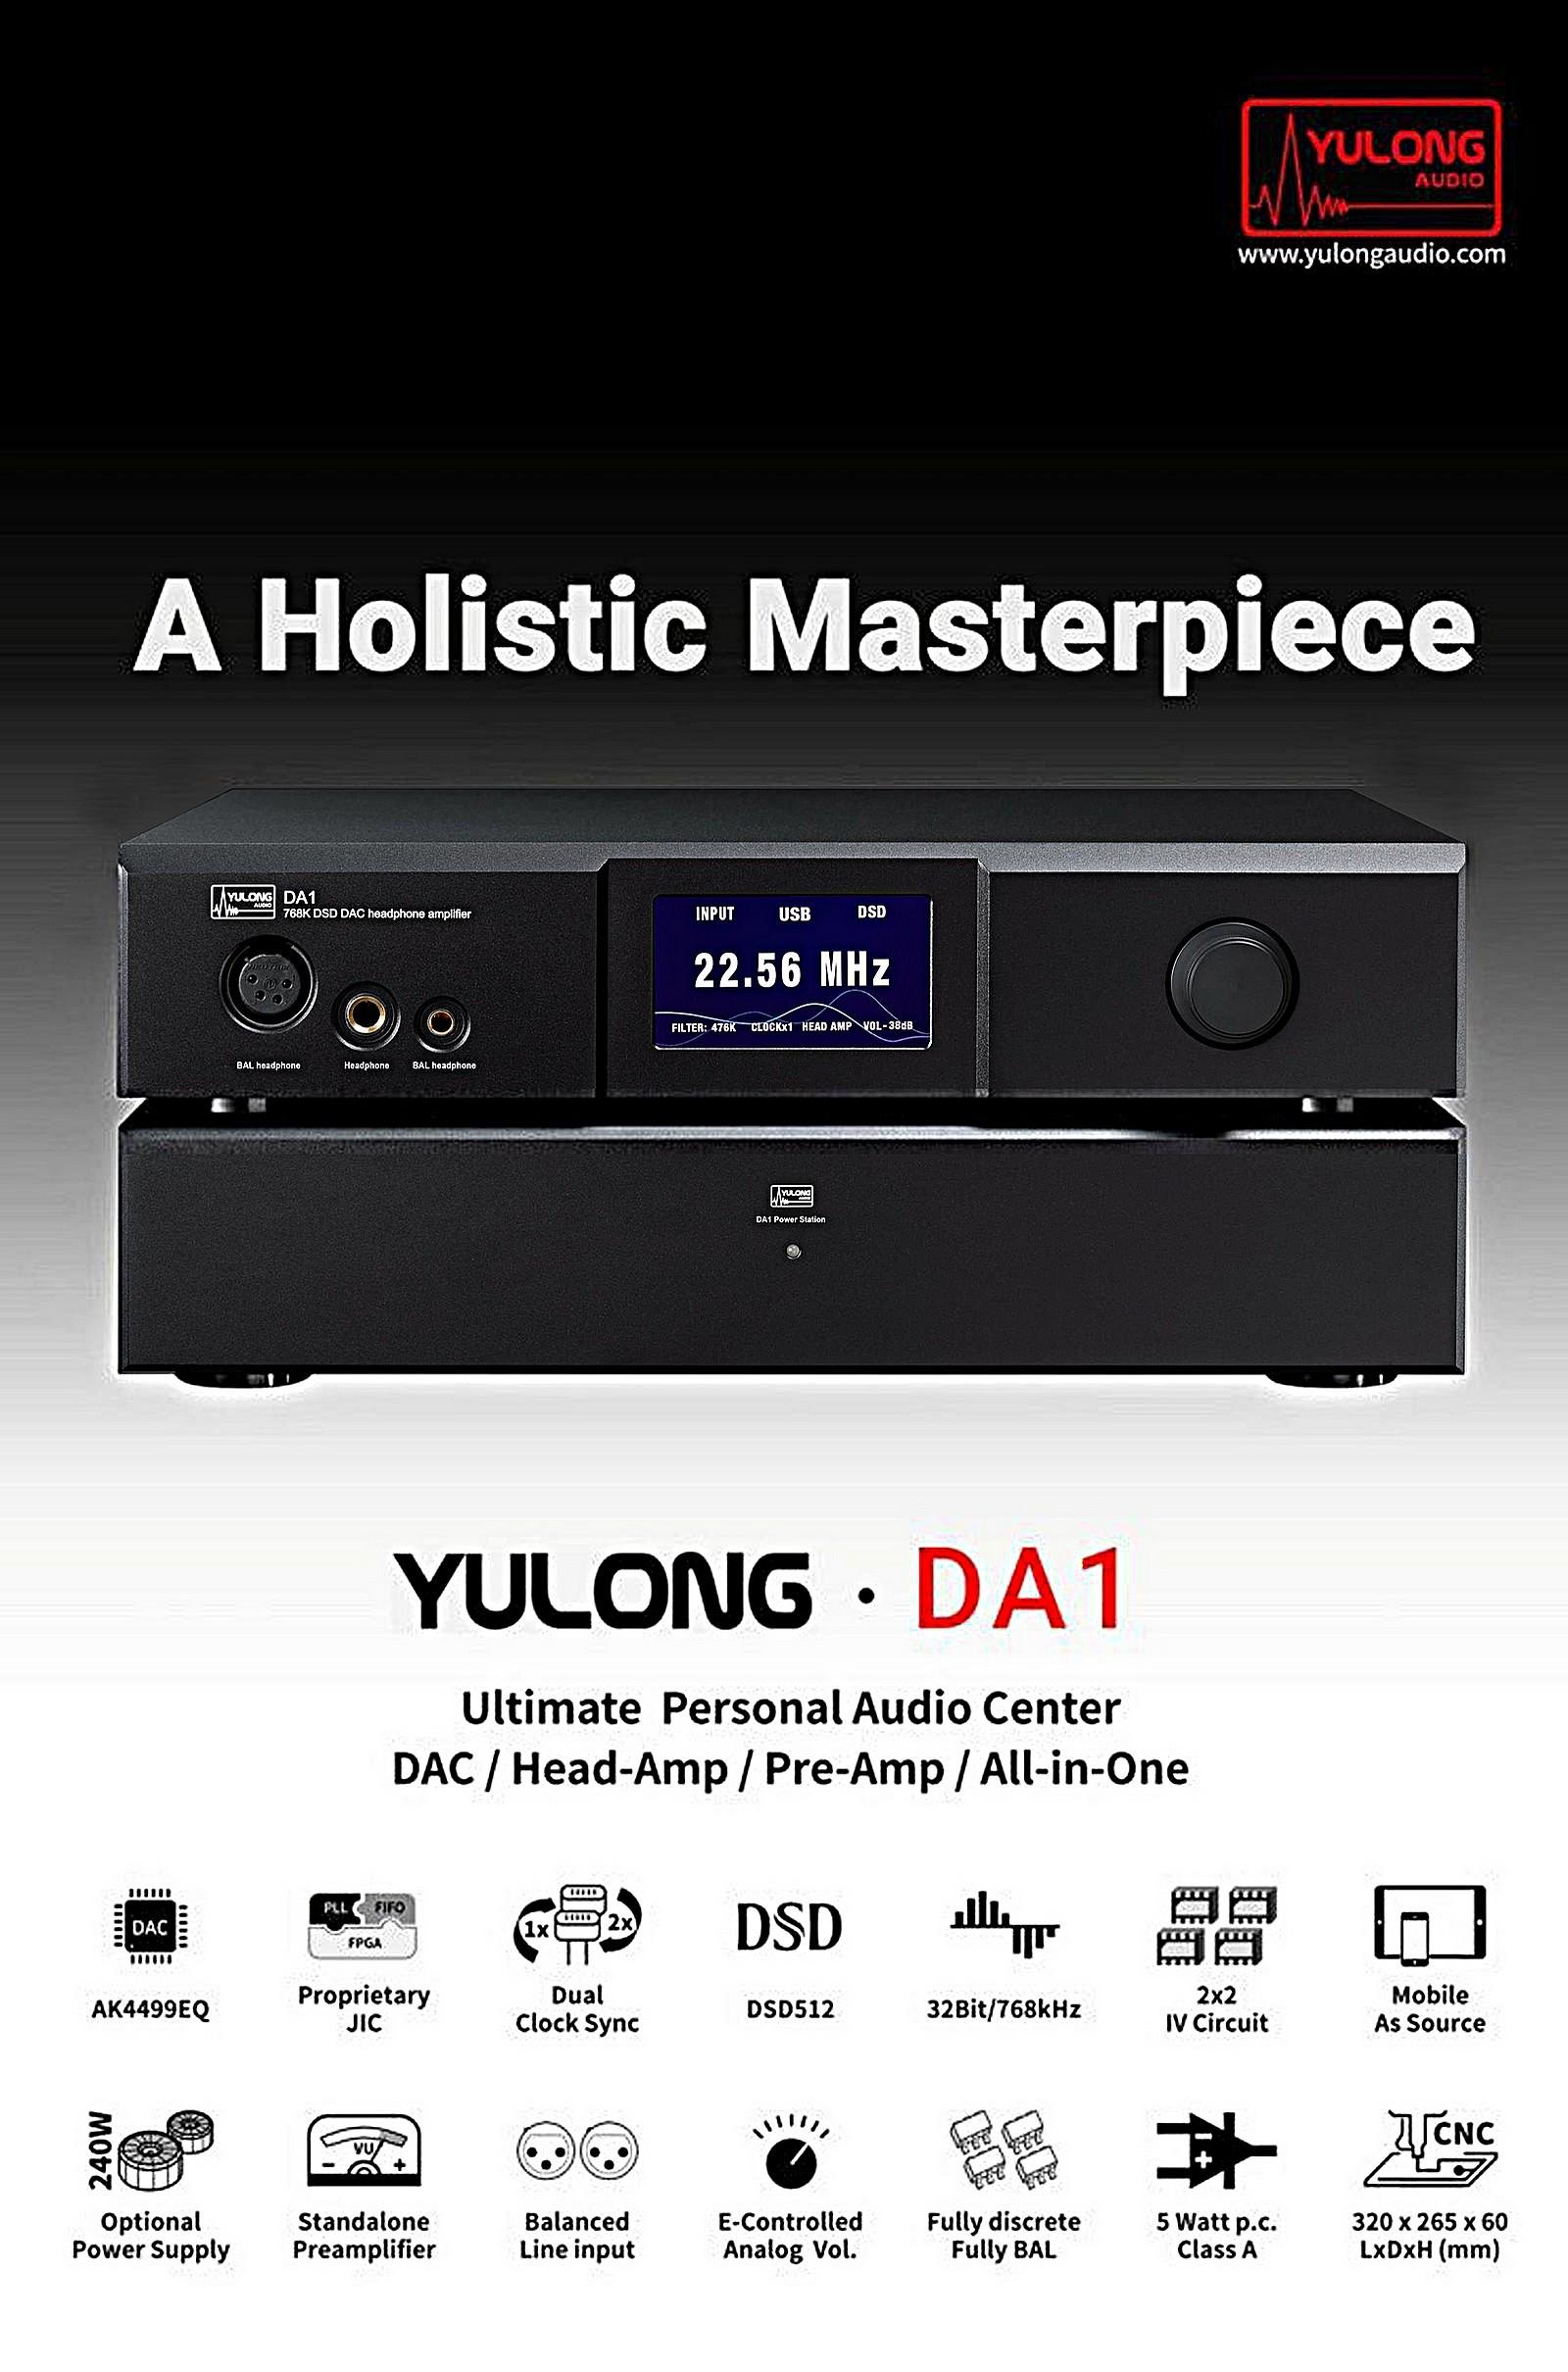 YULONG DA1 Sales Guide - 01.jpg